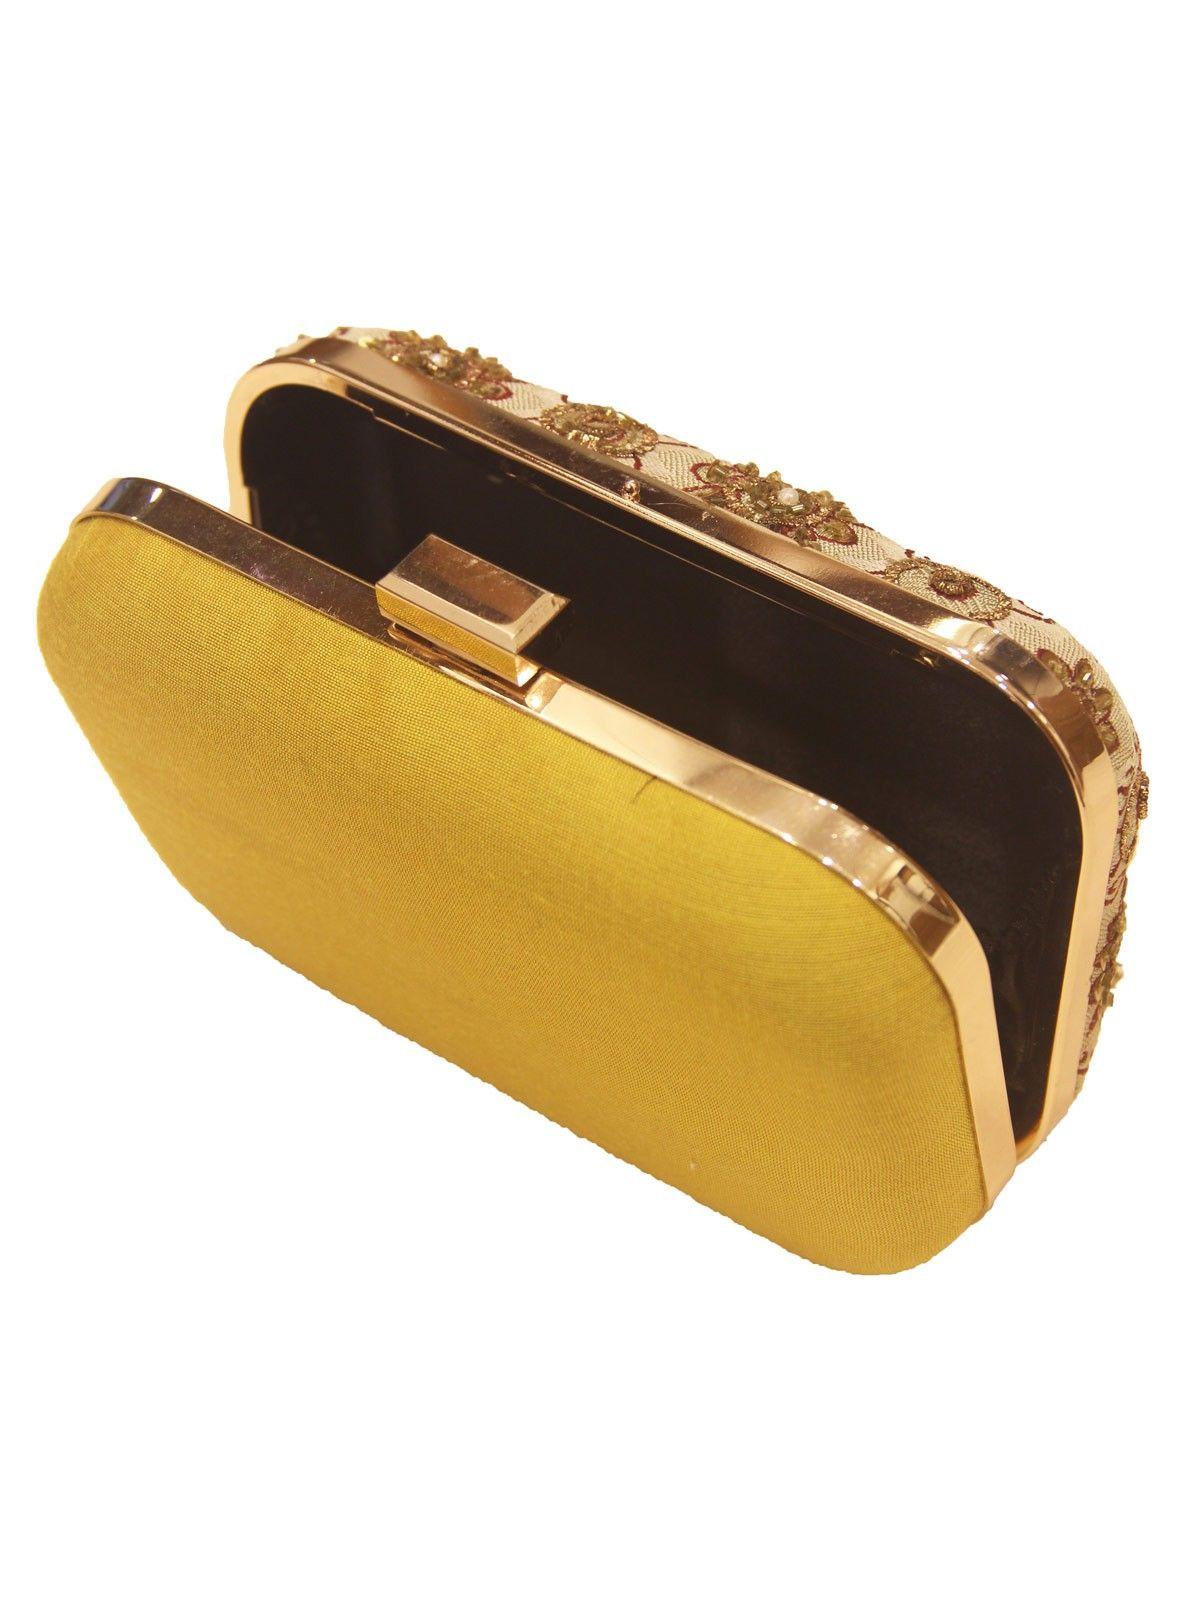 Mustard Yellow banarasi brocade metal framne  women's applique clutch